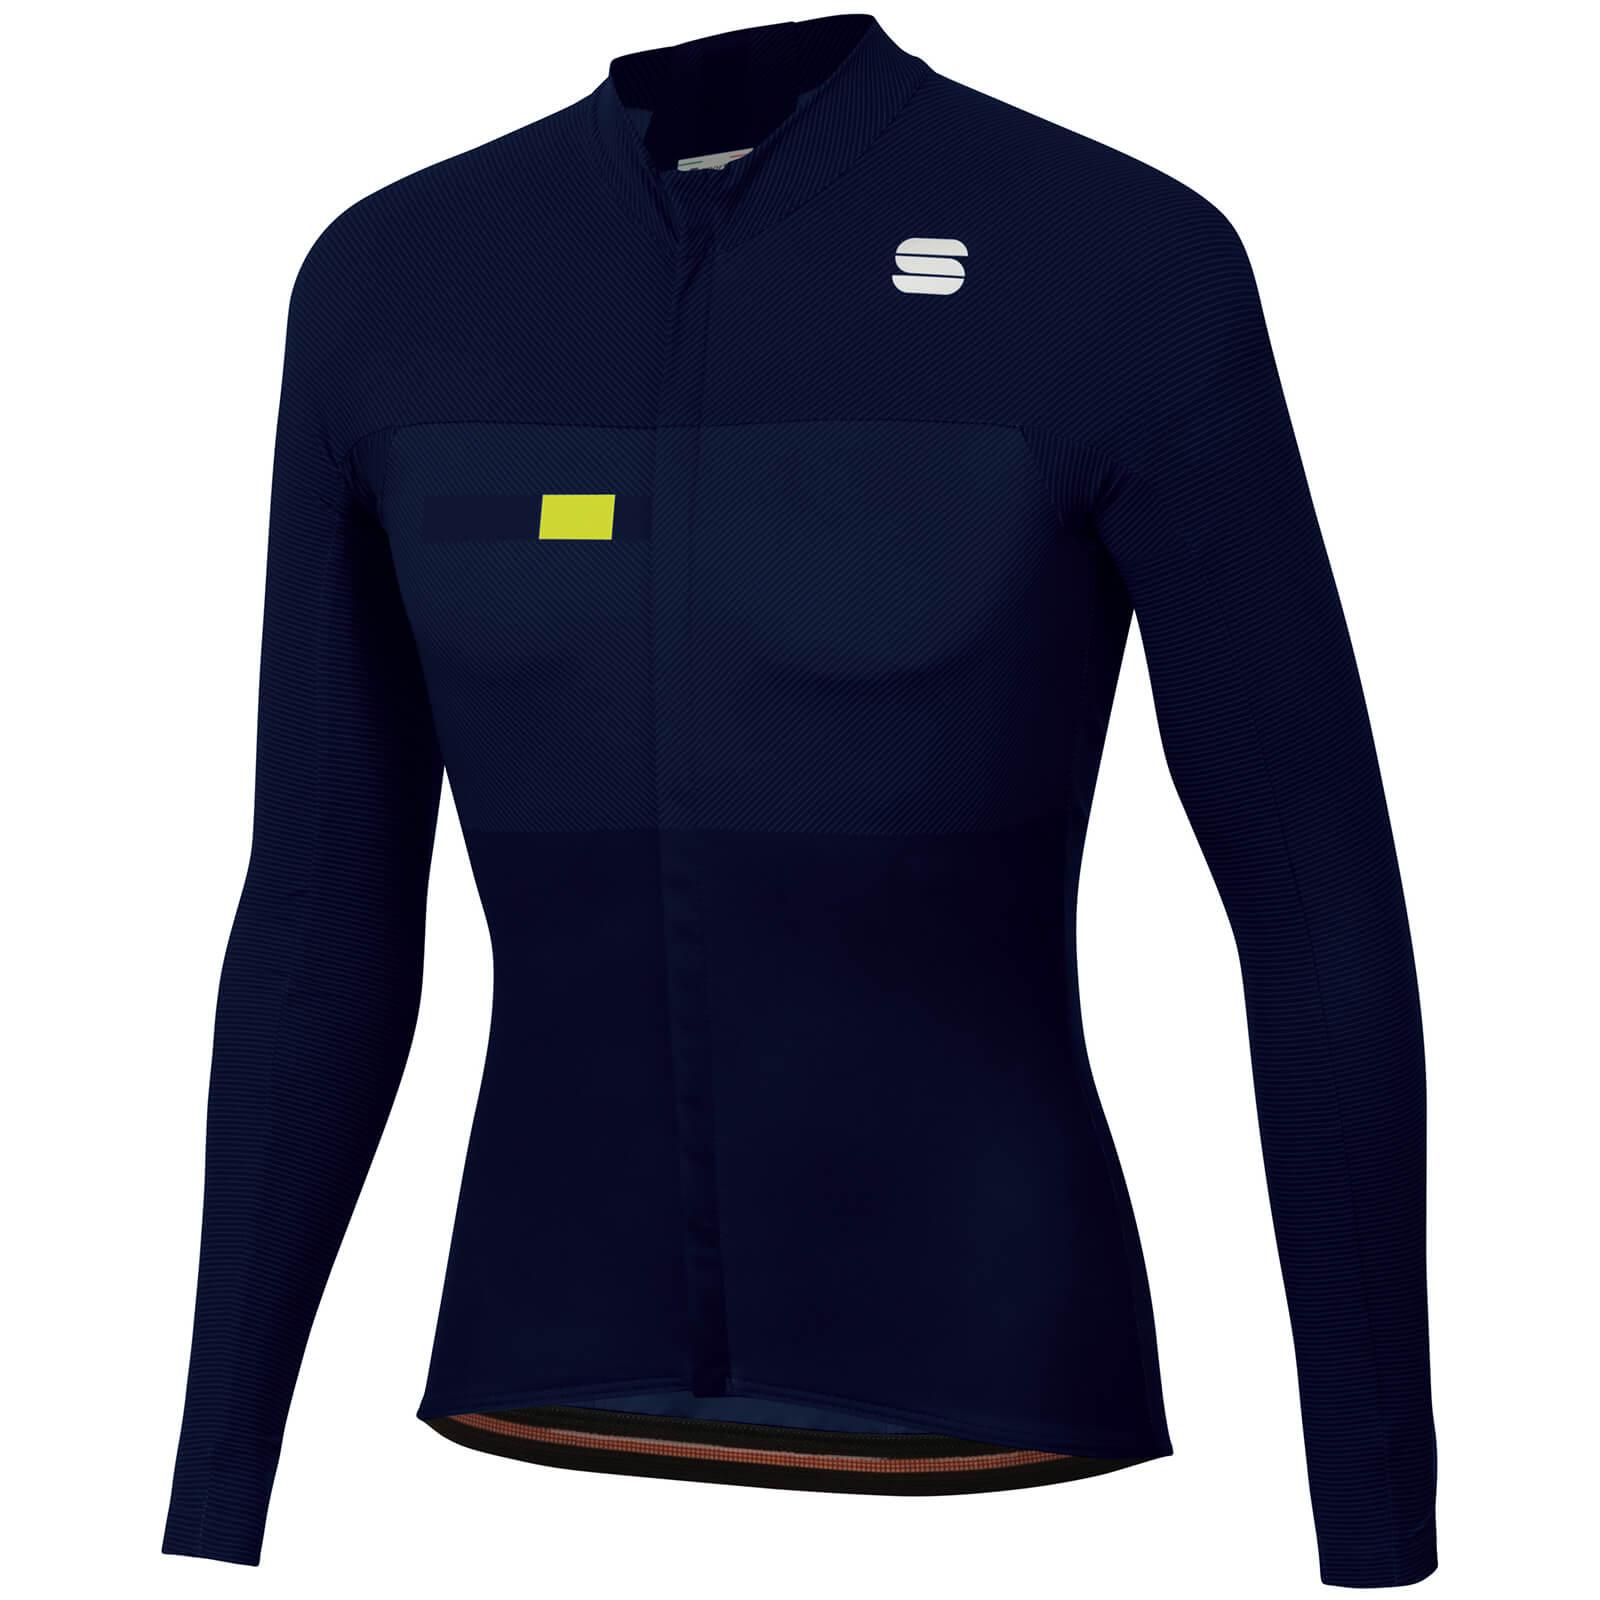 sportful bodyfit pro thermal jersey - l - blue/yellow fluo